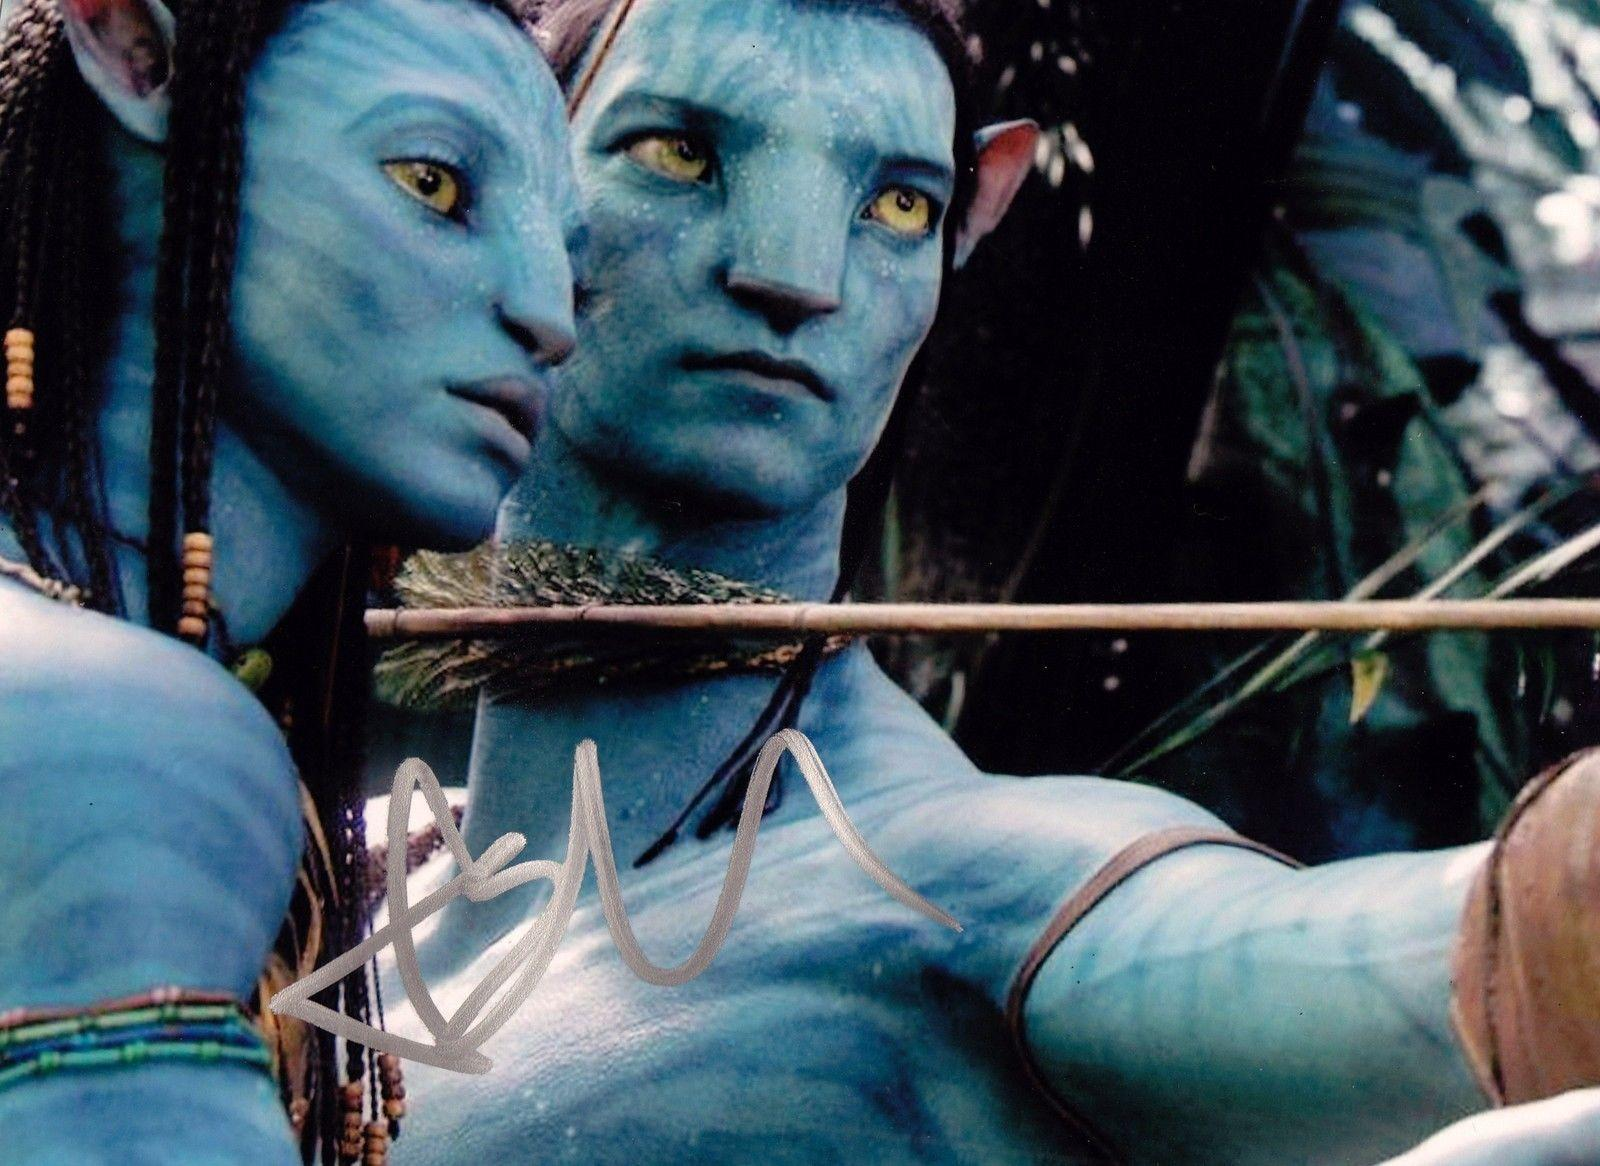 Sam Worthington Signed 8x10 Photo w/COA Proof Avatar Clash of the Titans F